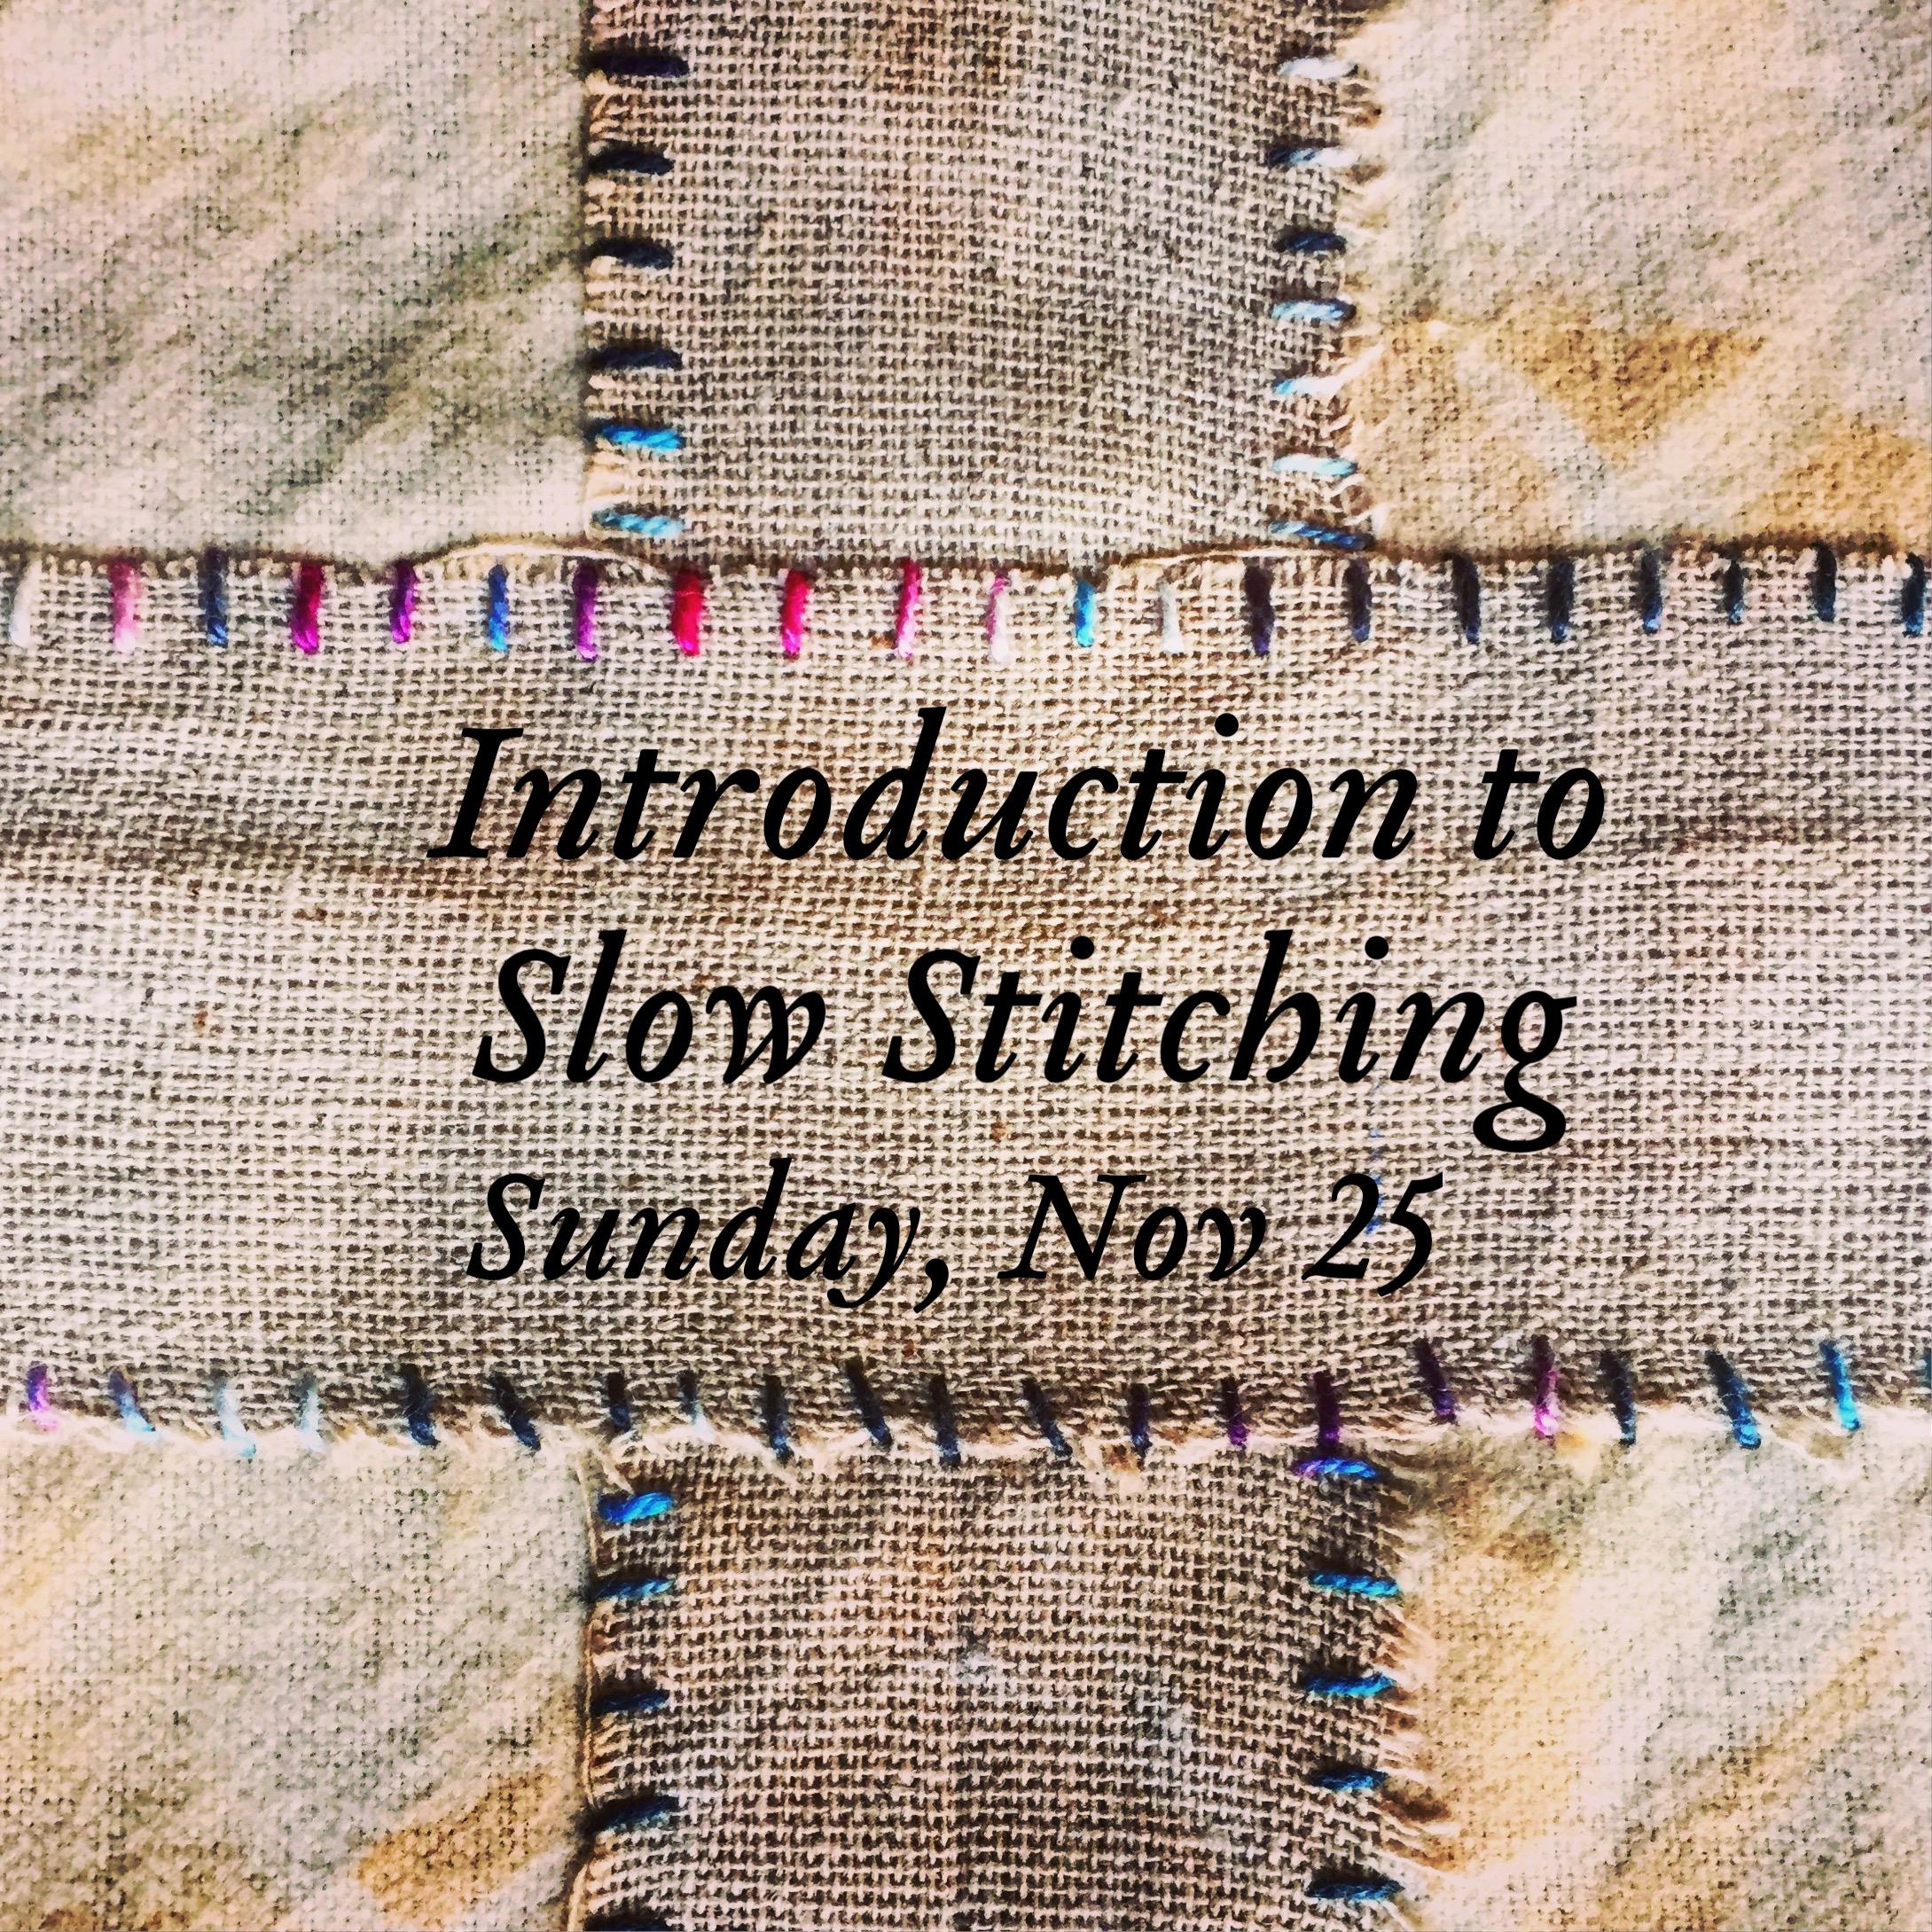 hand sewing slow stitch workshop